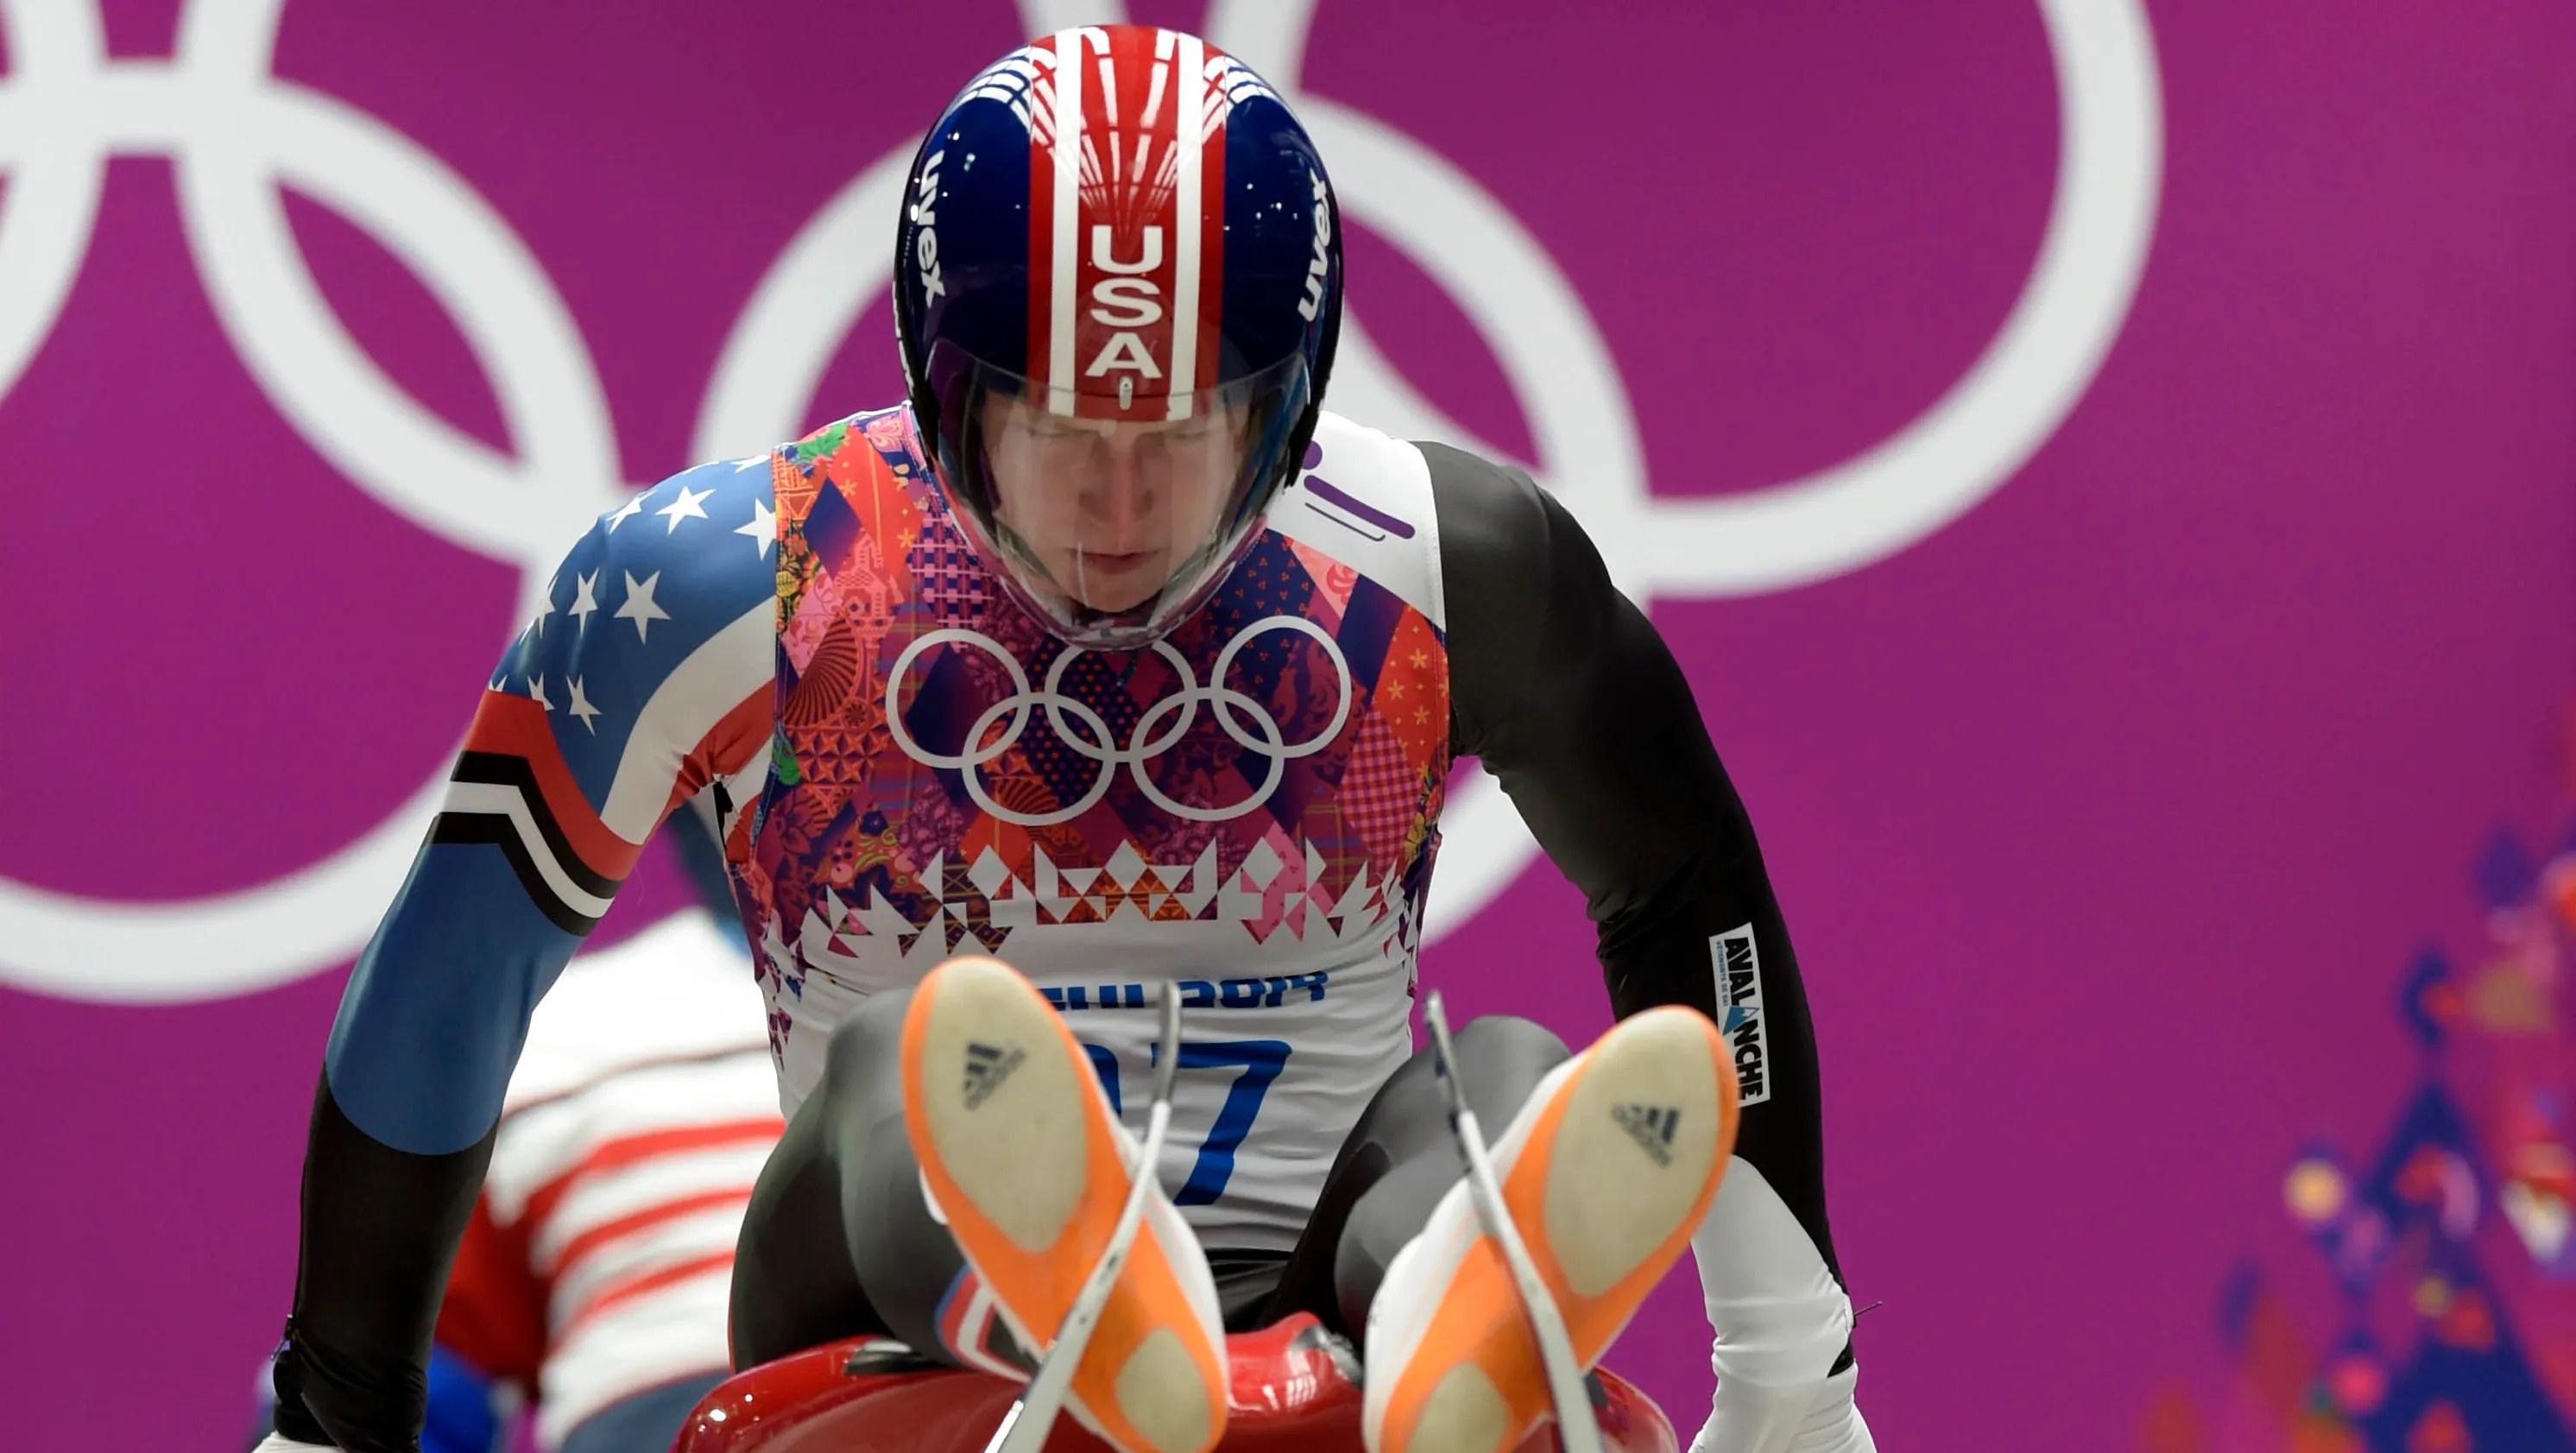 Best Photos From The Sochi Olympics Feb 8